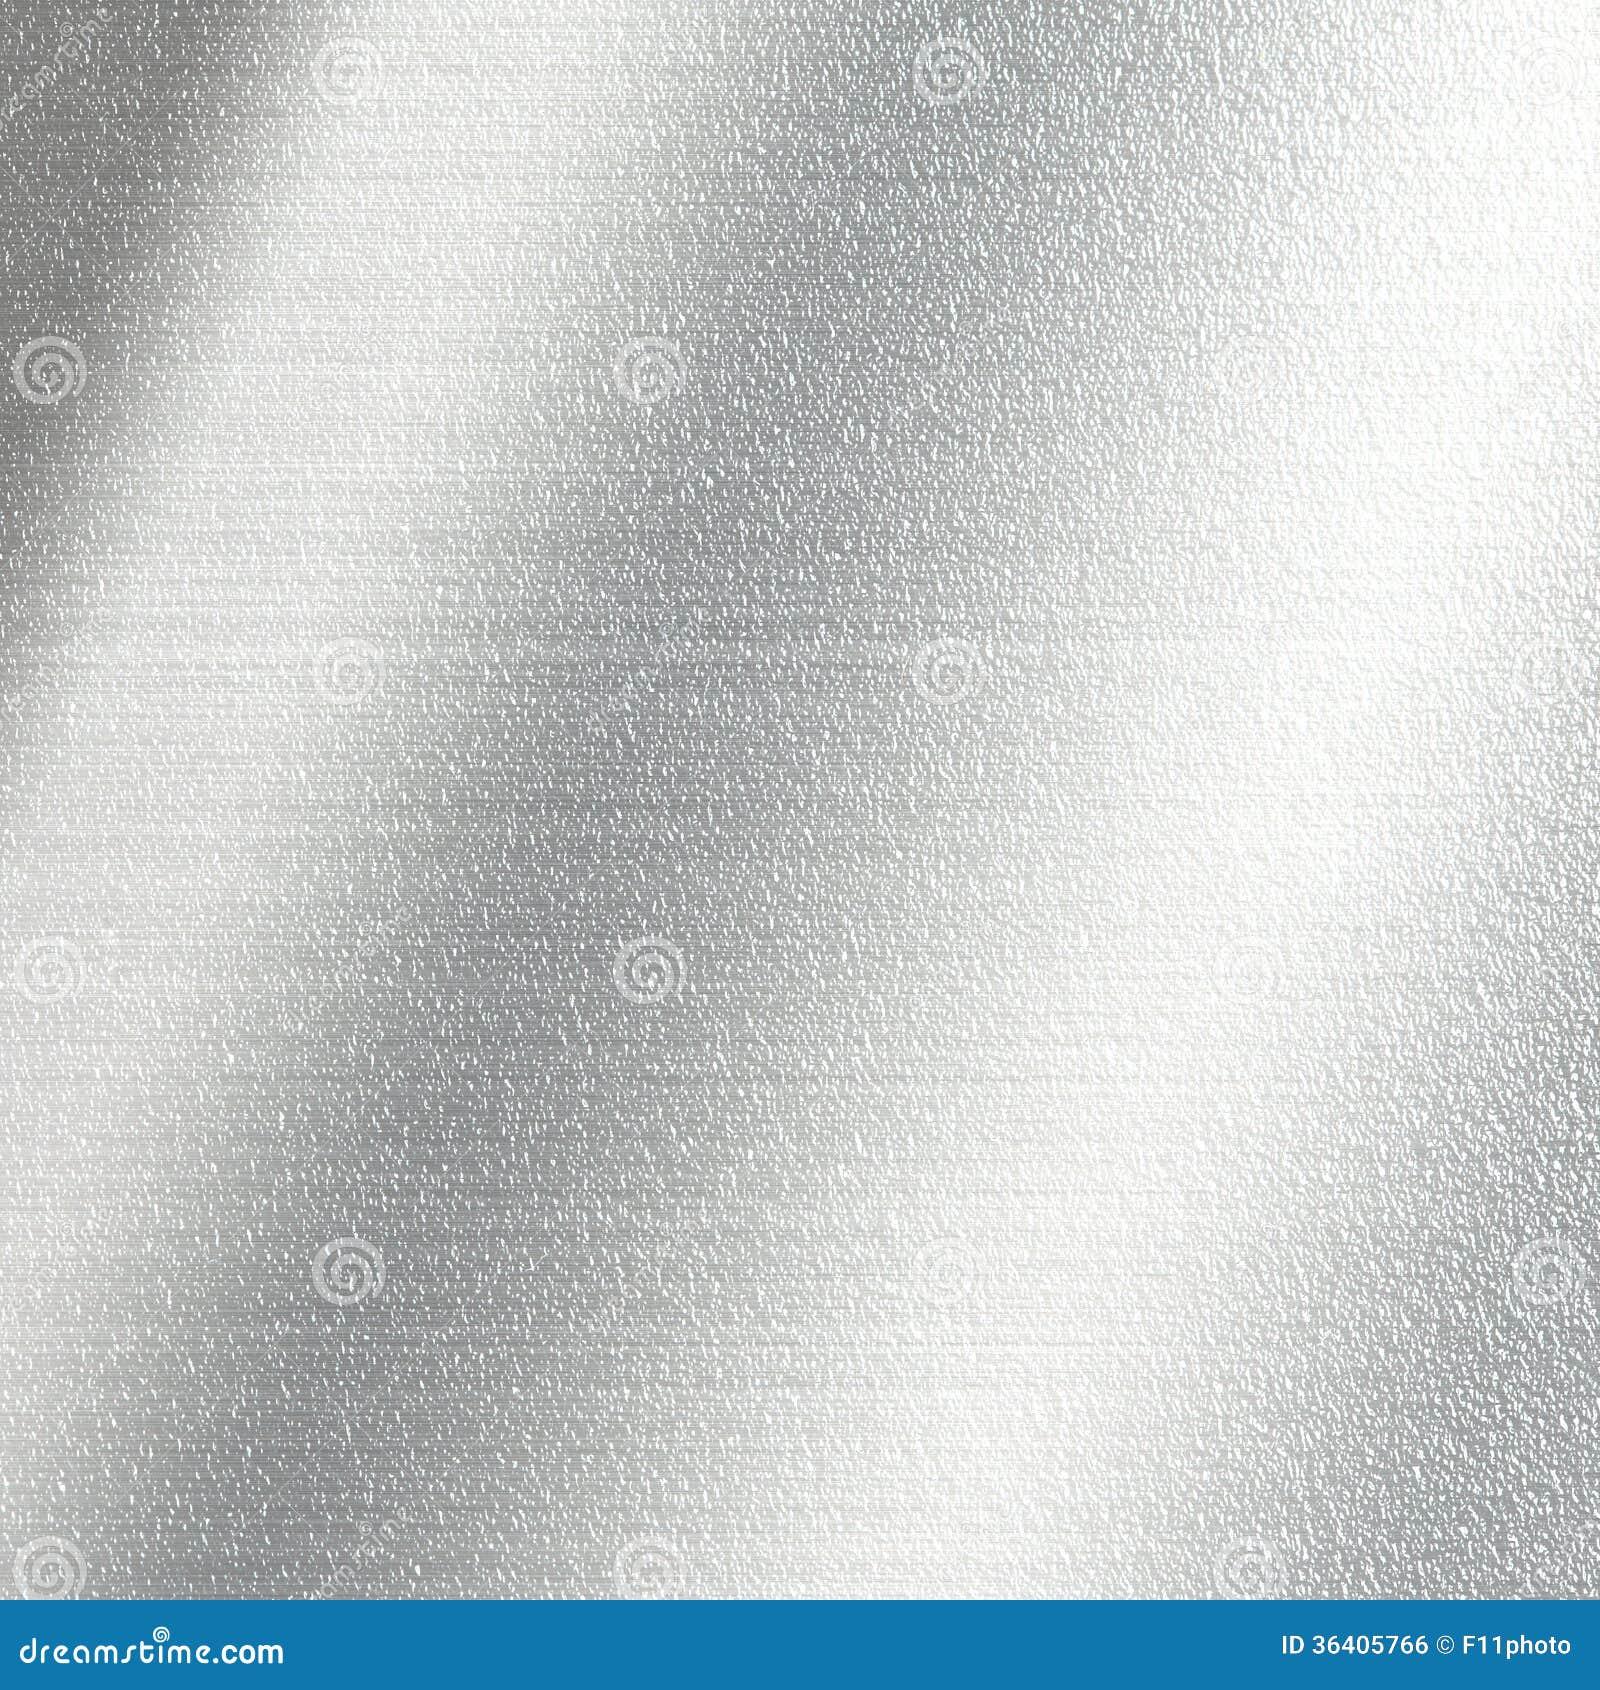 White PVC Plastic Texture Royalty Free Stock Image - Image ...  White PVC Plast...